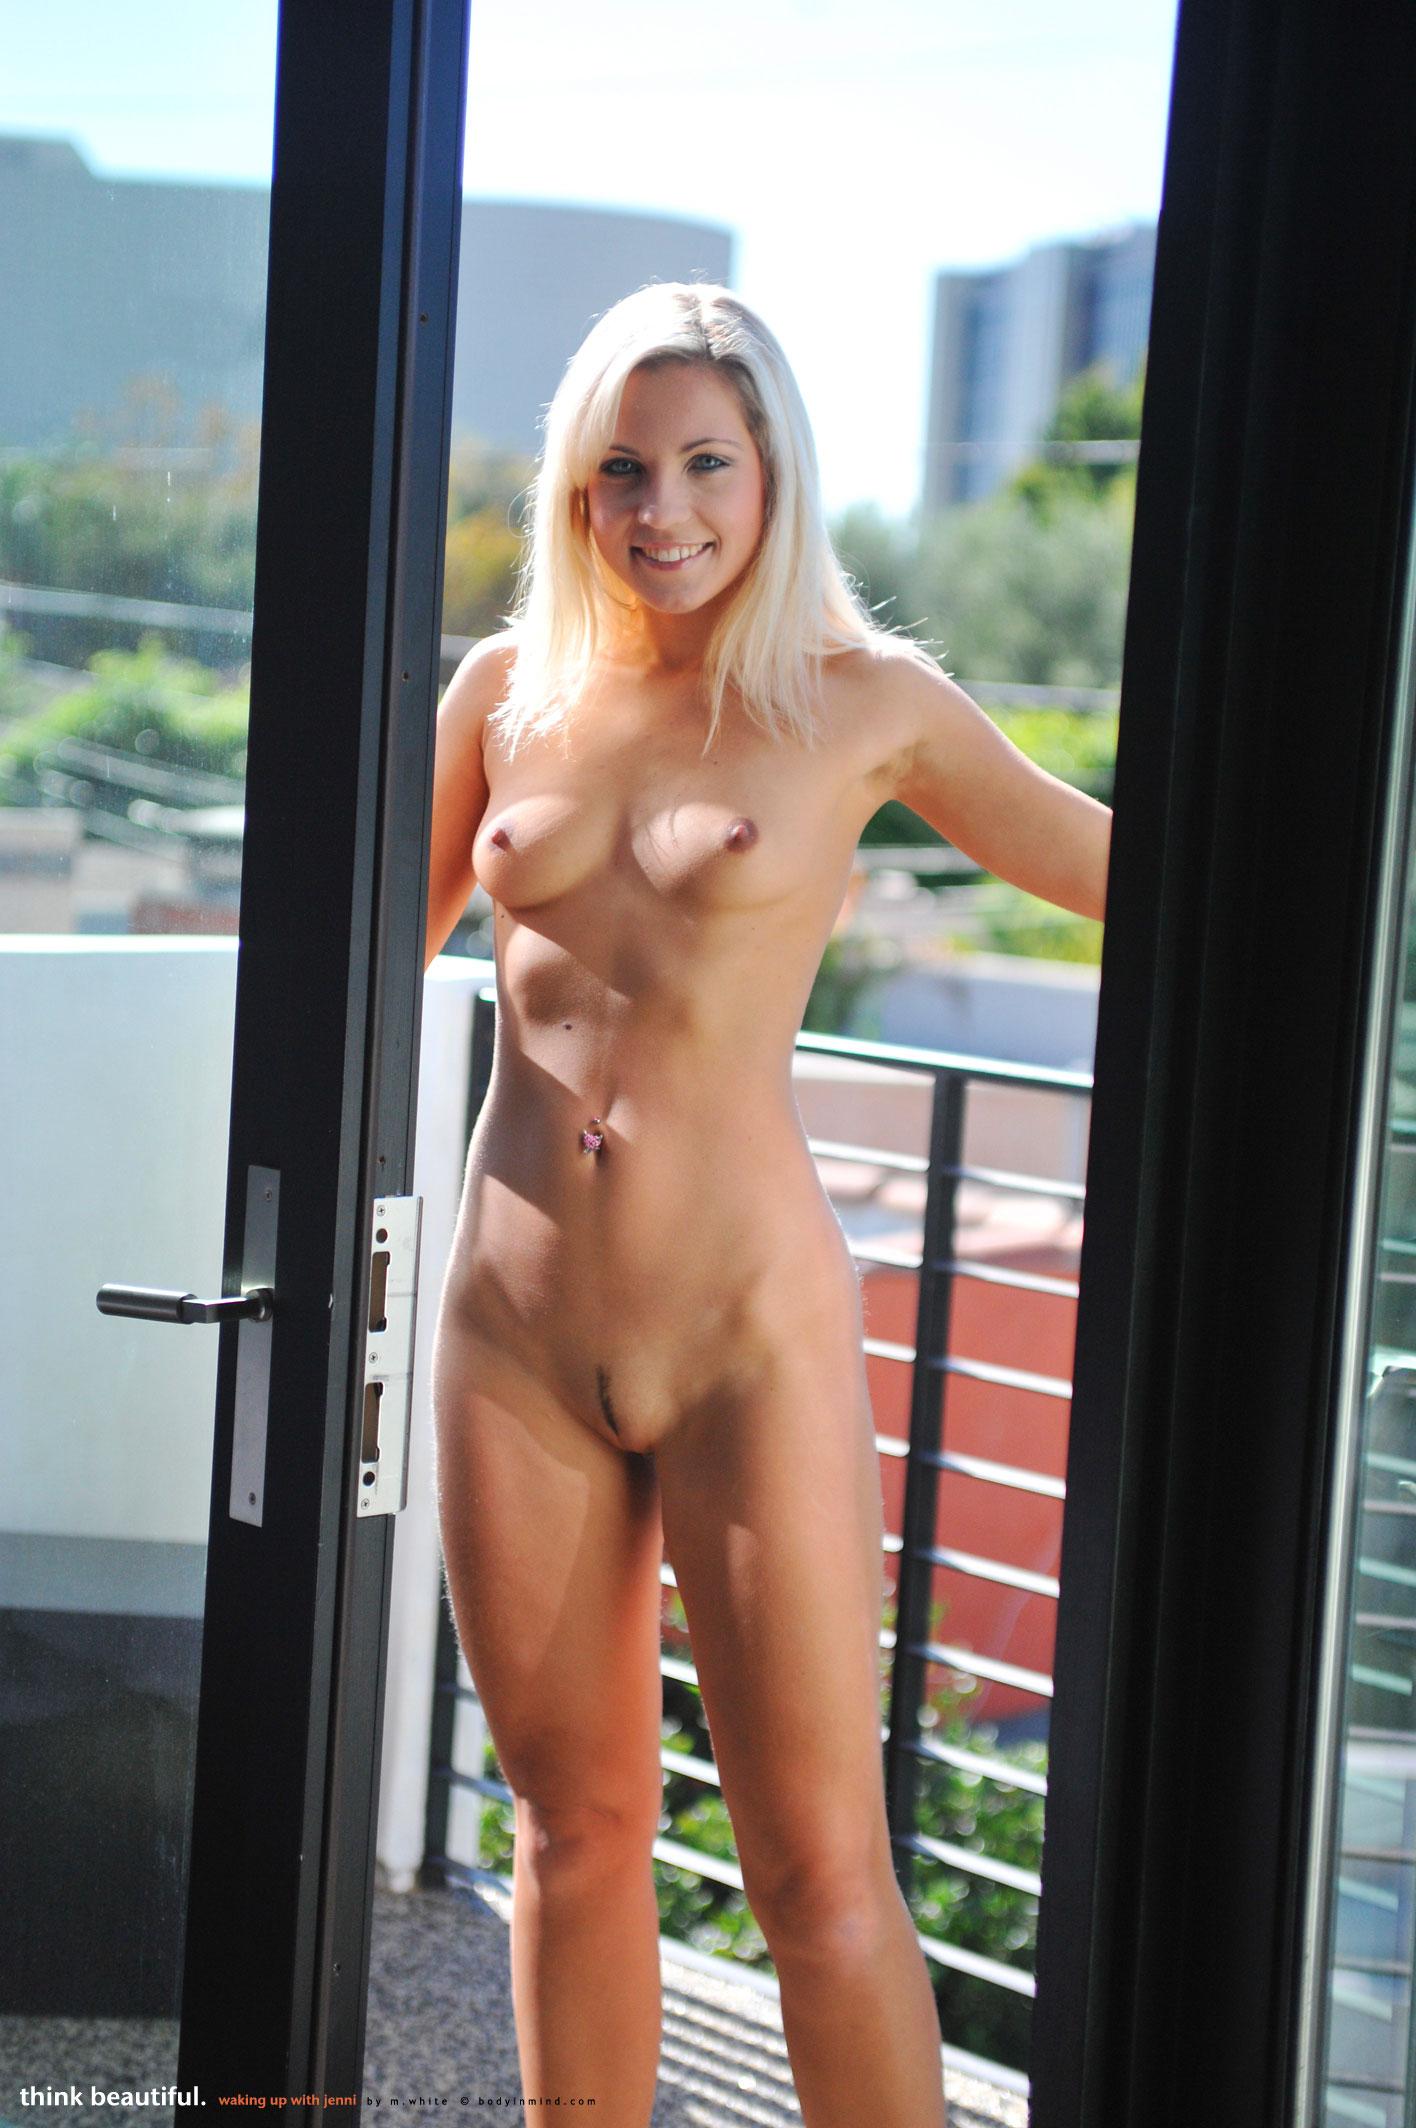 Nude Pictures Girlfriend Ex#3